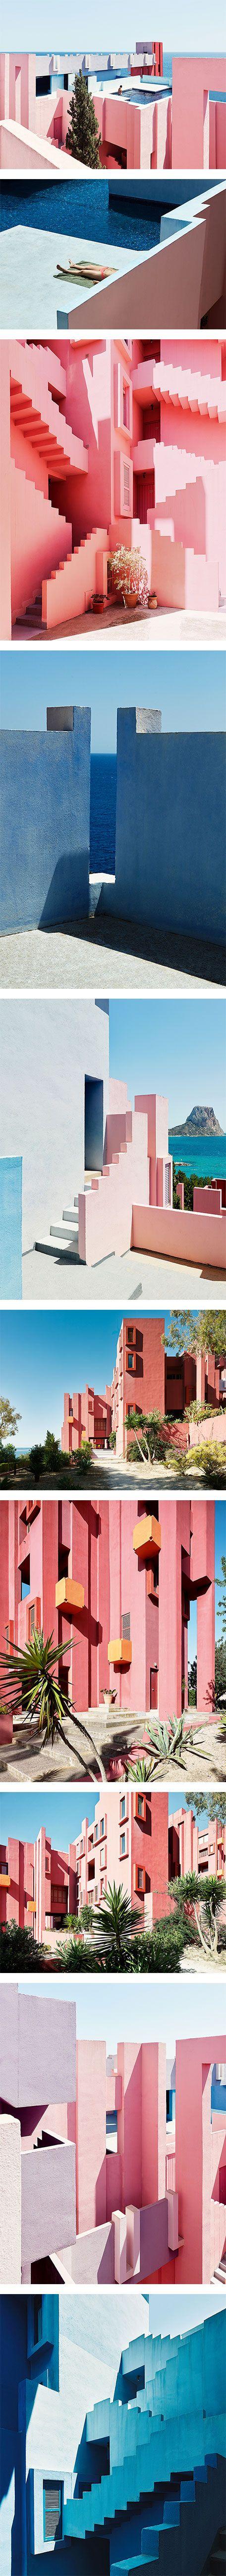 La Muralla Roja. SPAIN